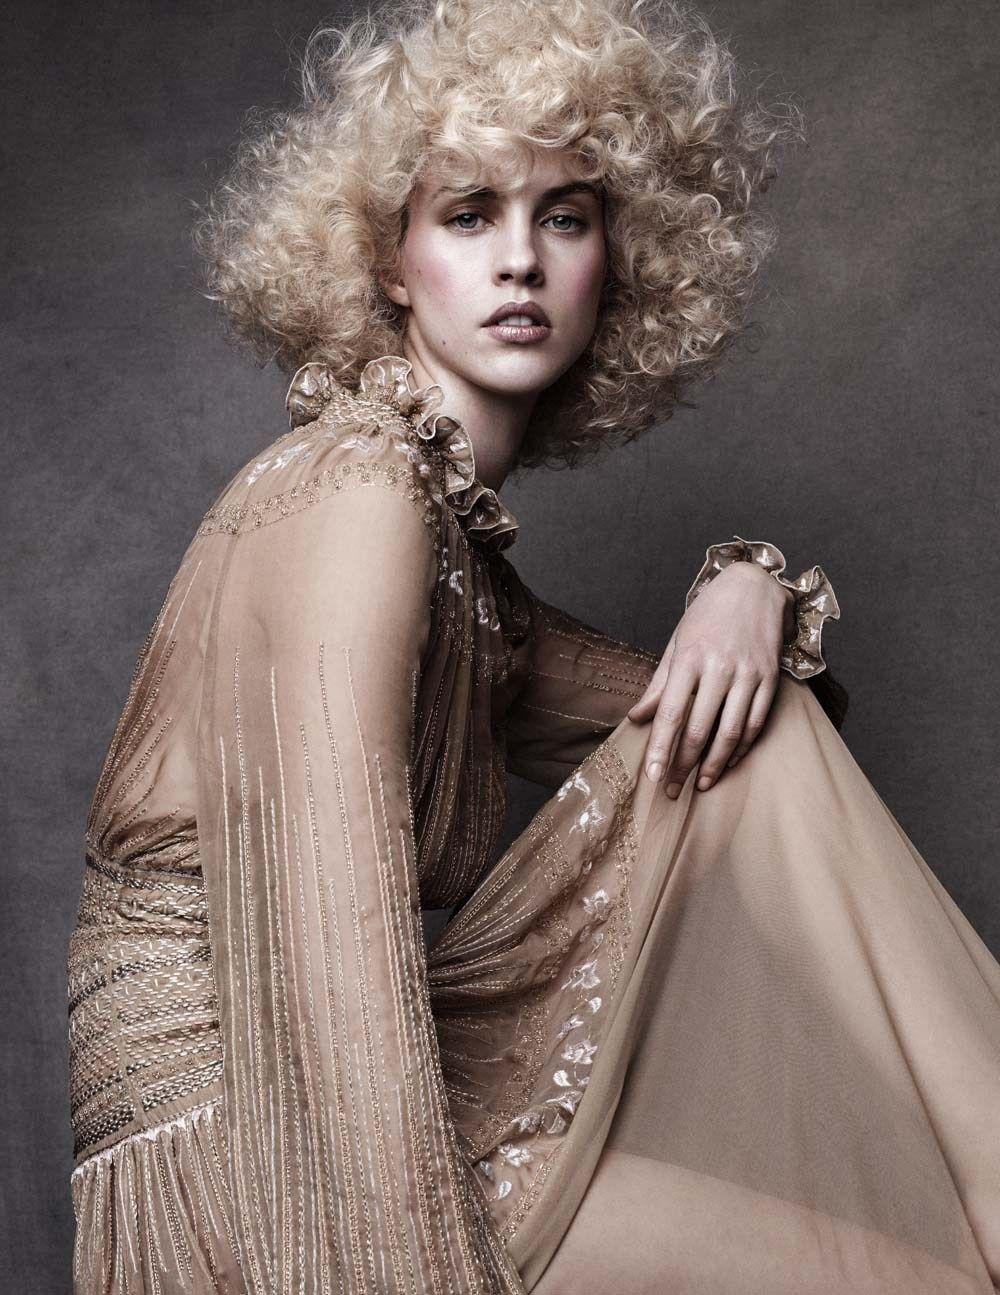 ogue Spain April 2015 Model: Julia Frauche Photographer: Alvaro Beamud Cortes Fashion Editor: Marina Gallo Hair: Franco Argento